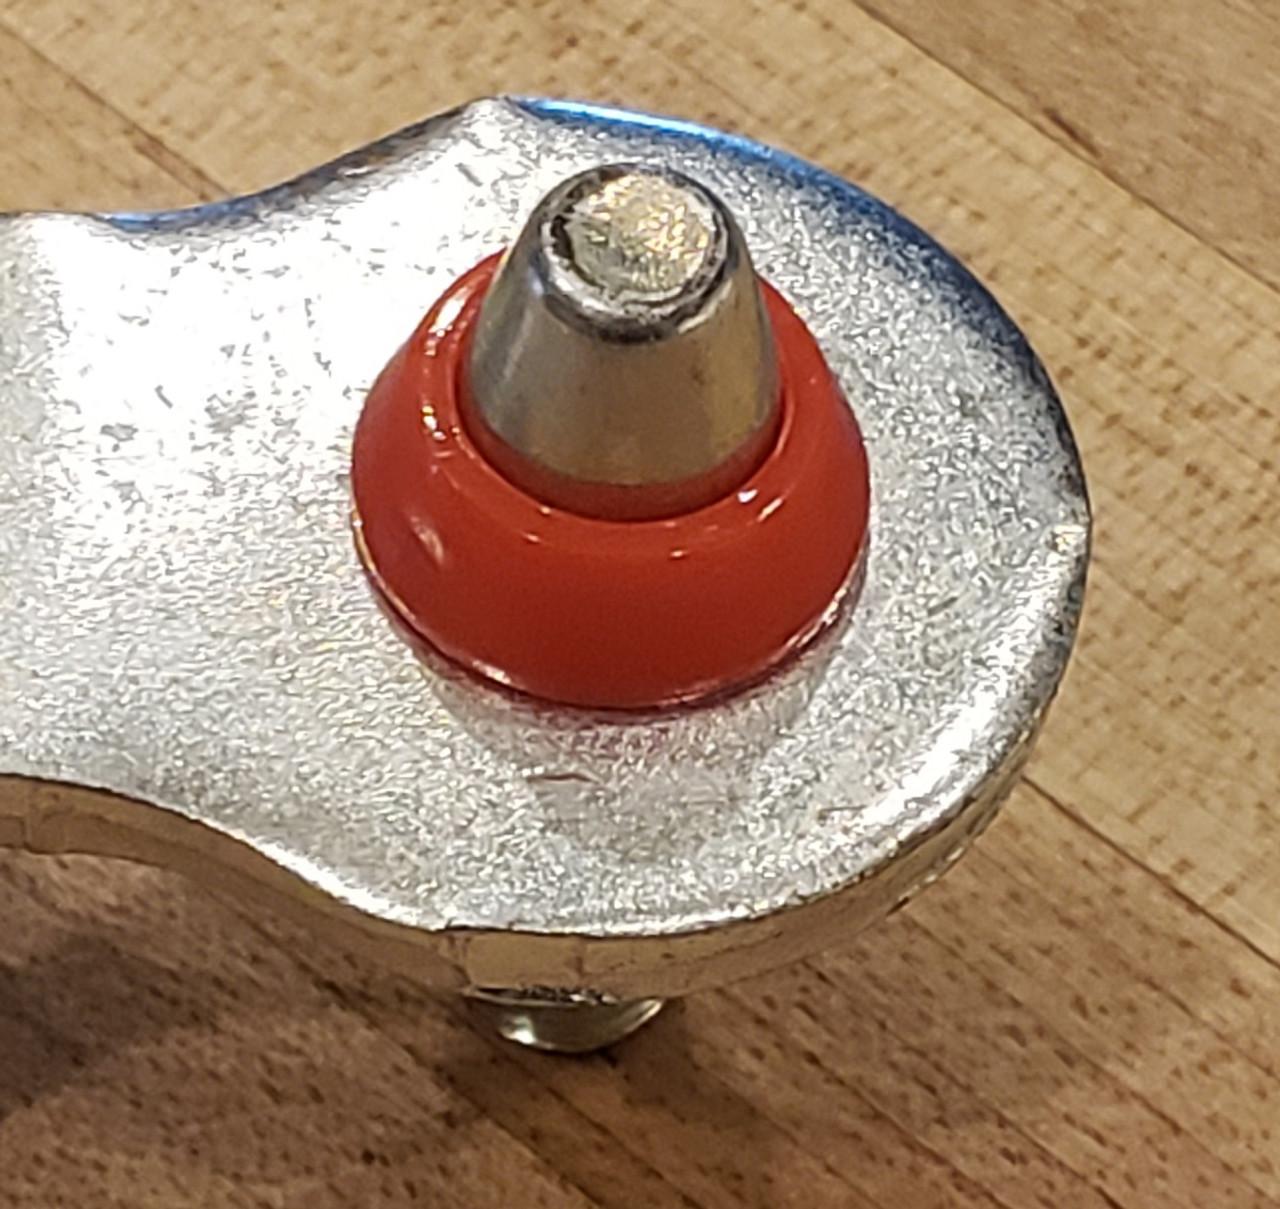 Mercury Cougar FA1KIT™ Transmission Shift Lever / Linkage Replacement Bushing Kit fits onto pin as shown.